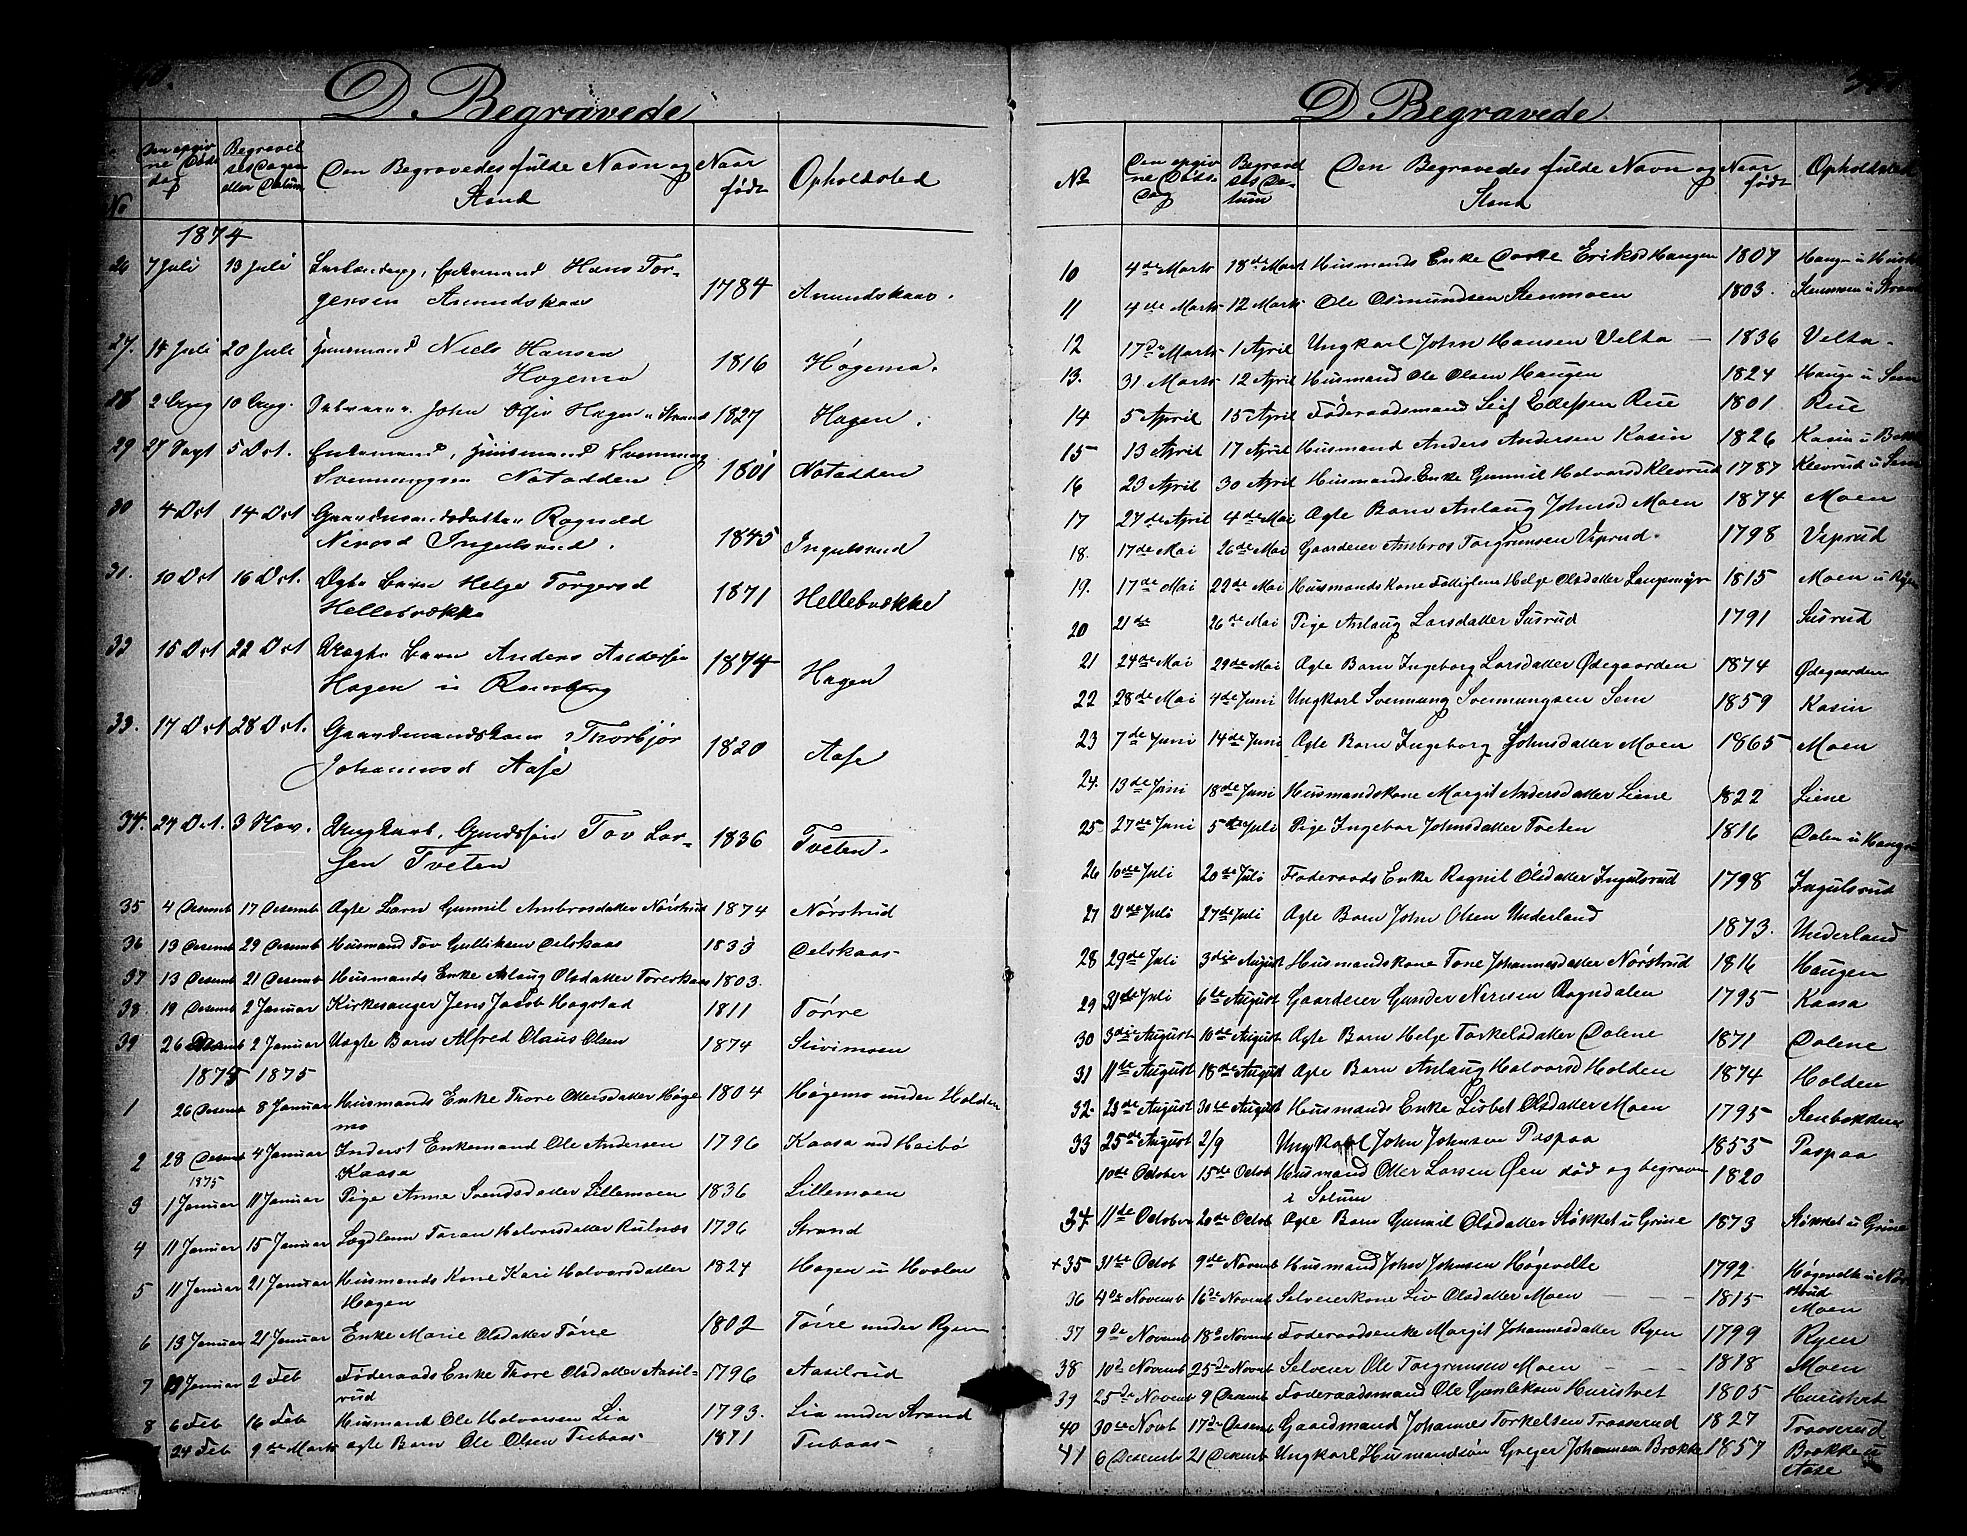 SAKO, Heddal kirkebøker, G/Ga/L0001: Klokkerbok nr. I 1, 1866-1878, s. 340-341